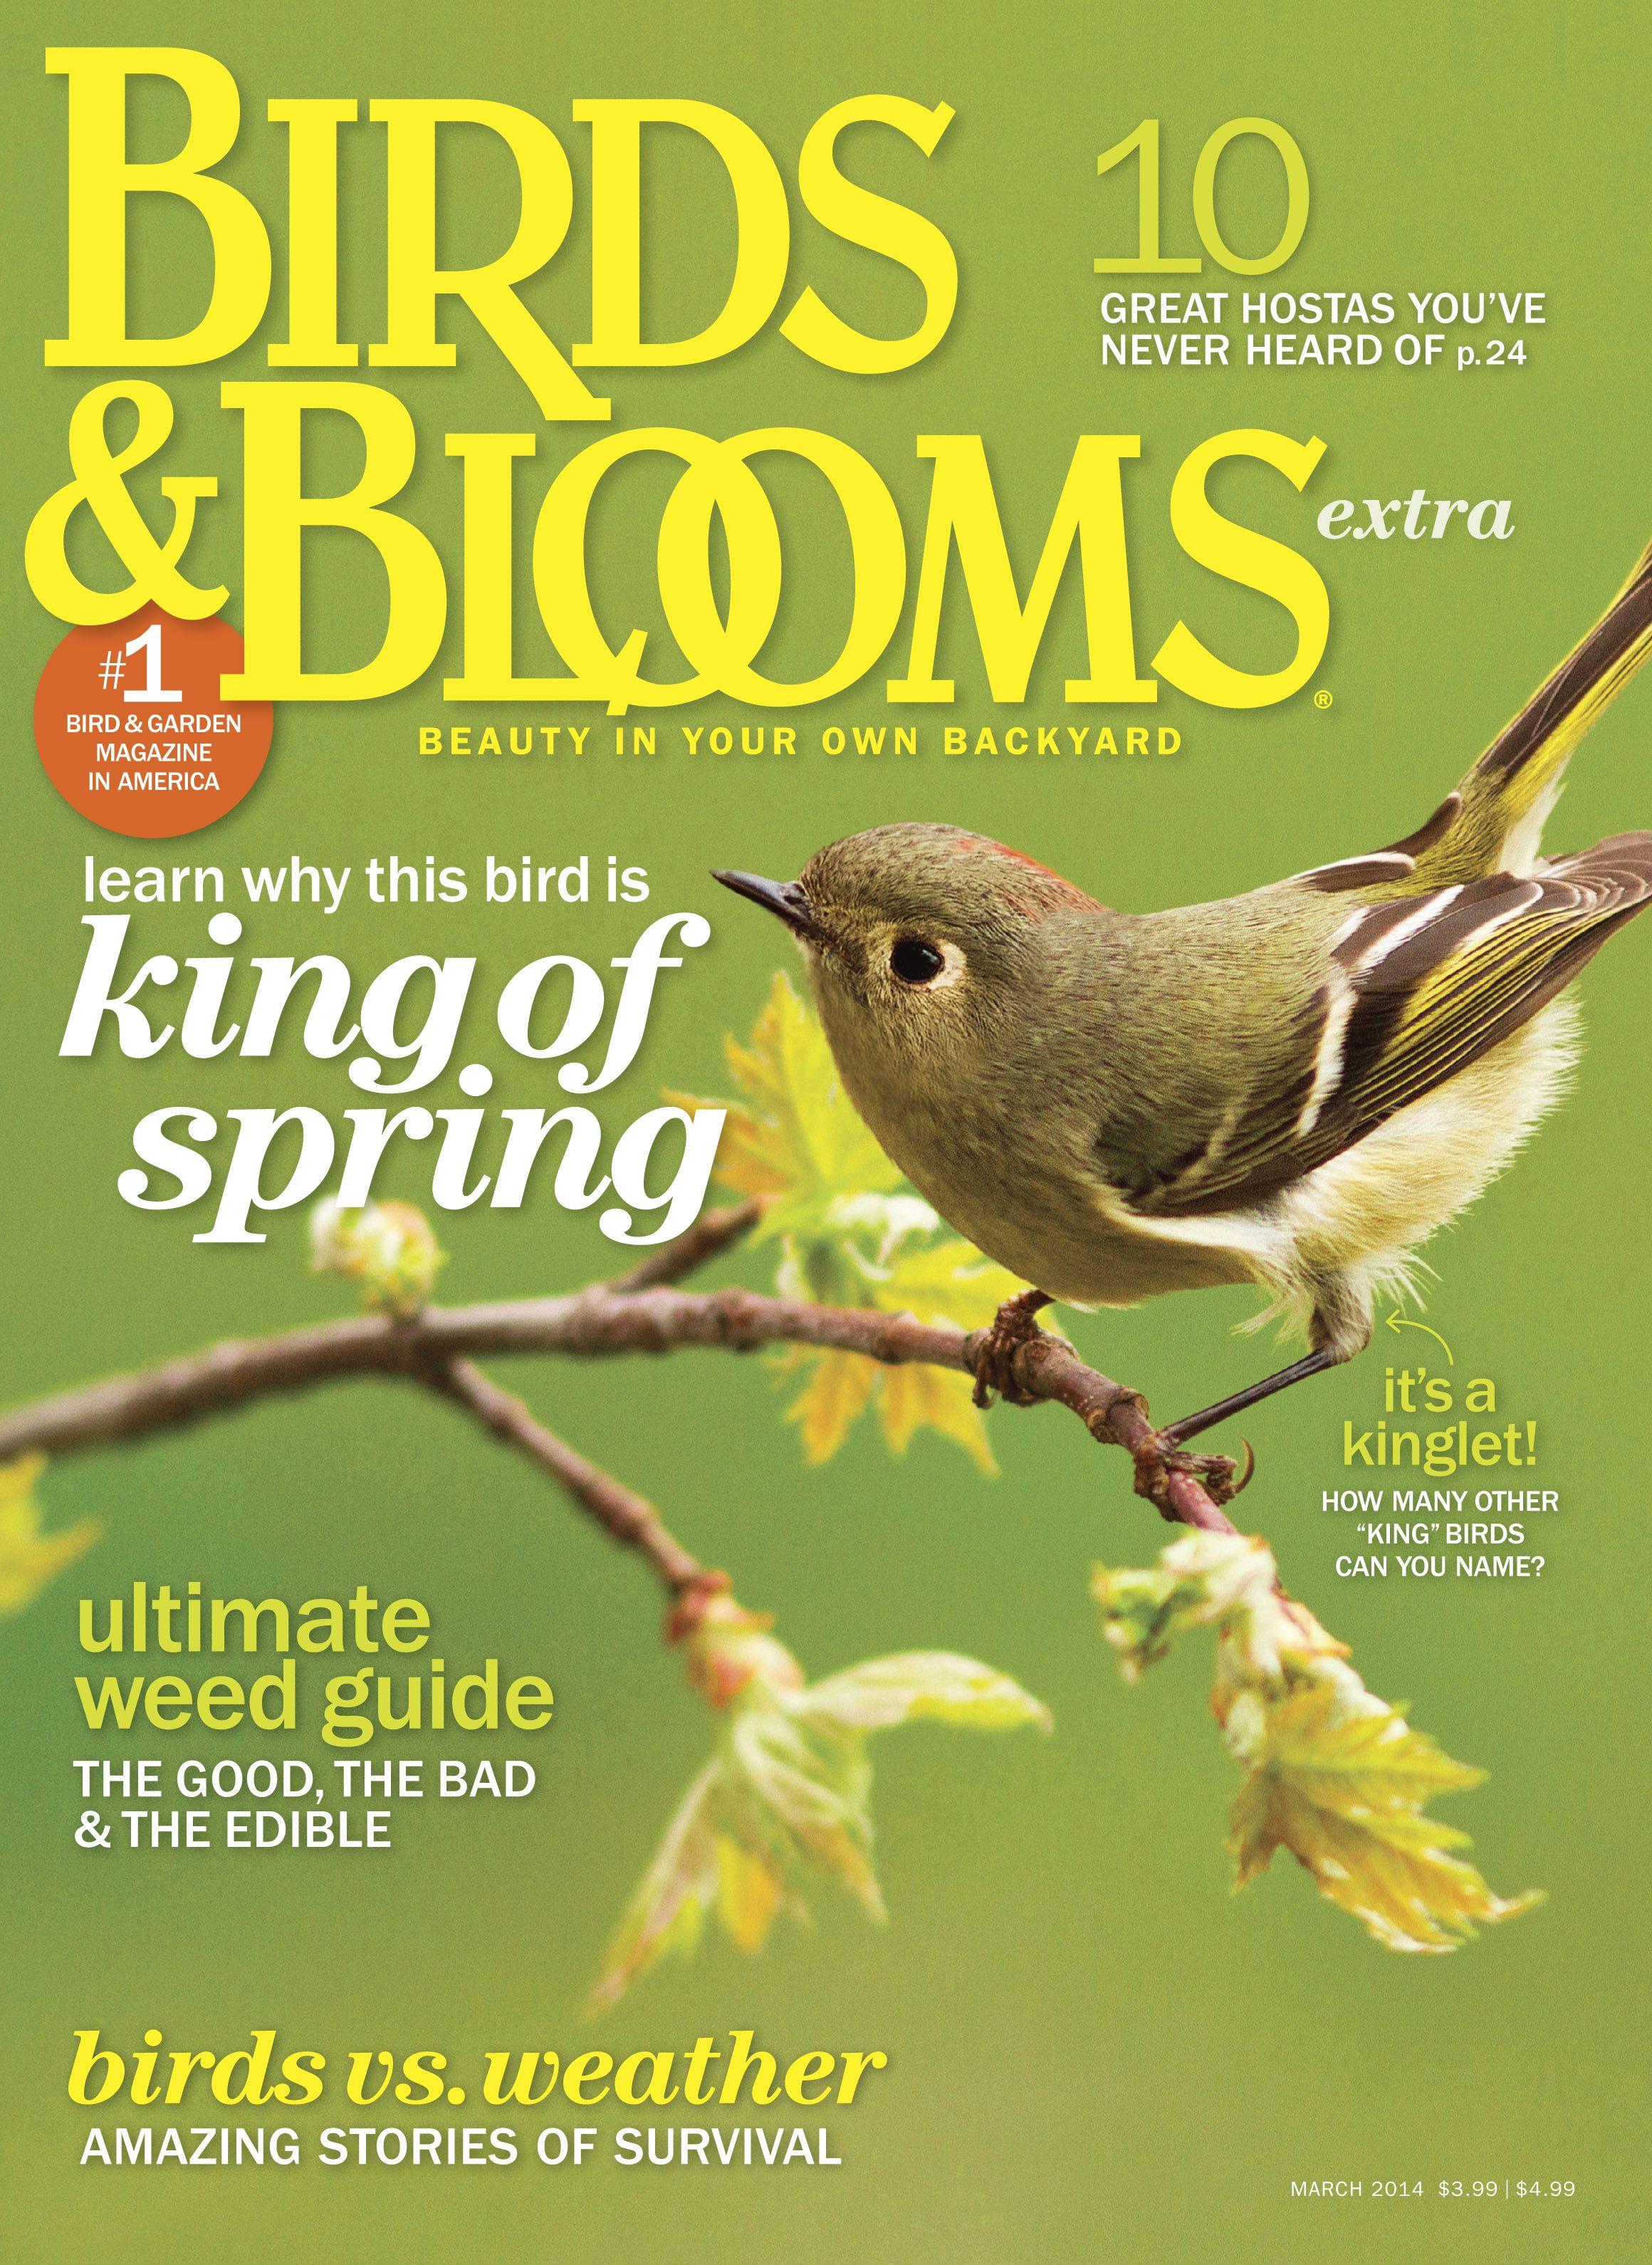 March 2014 Birds Blooms Extra Birdsandblooms Com How To